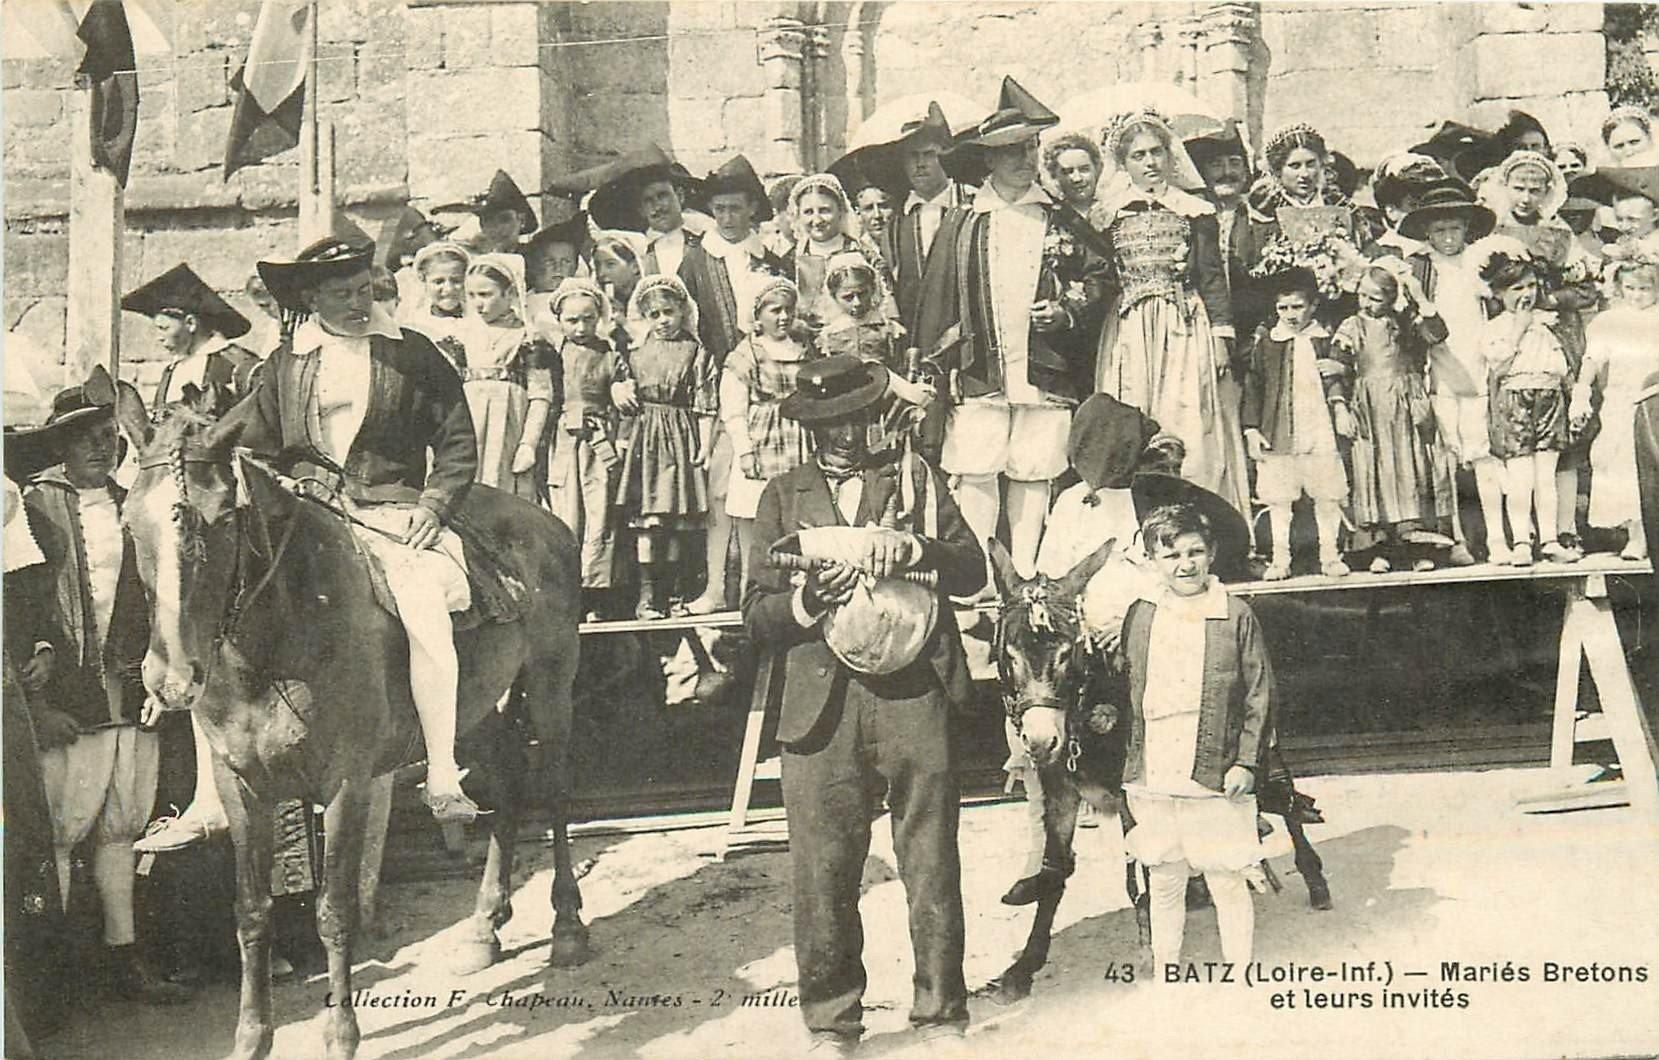 44 BATZ. Mariés Bretons et leurs invités Paludiers avec âne